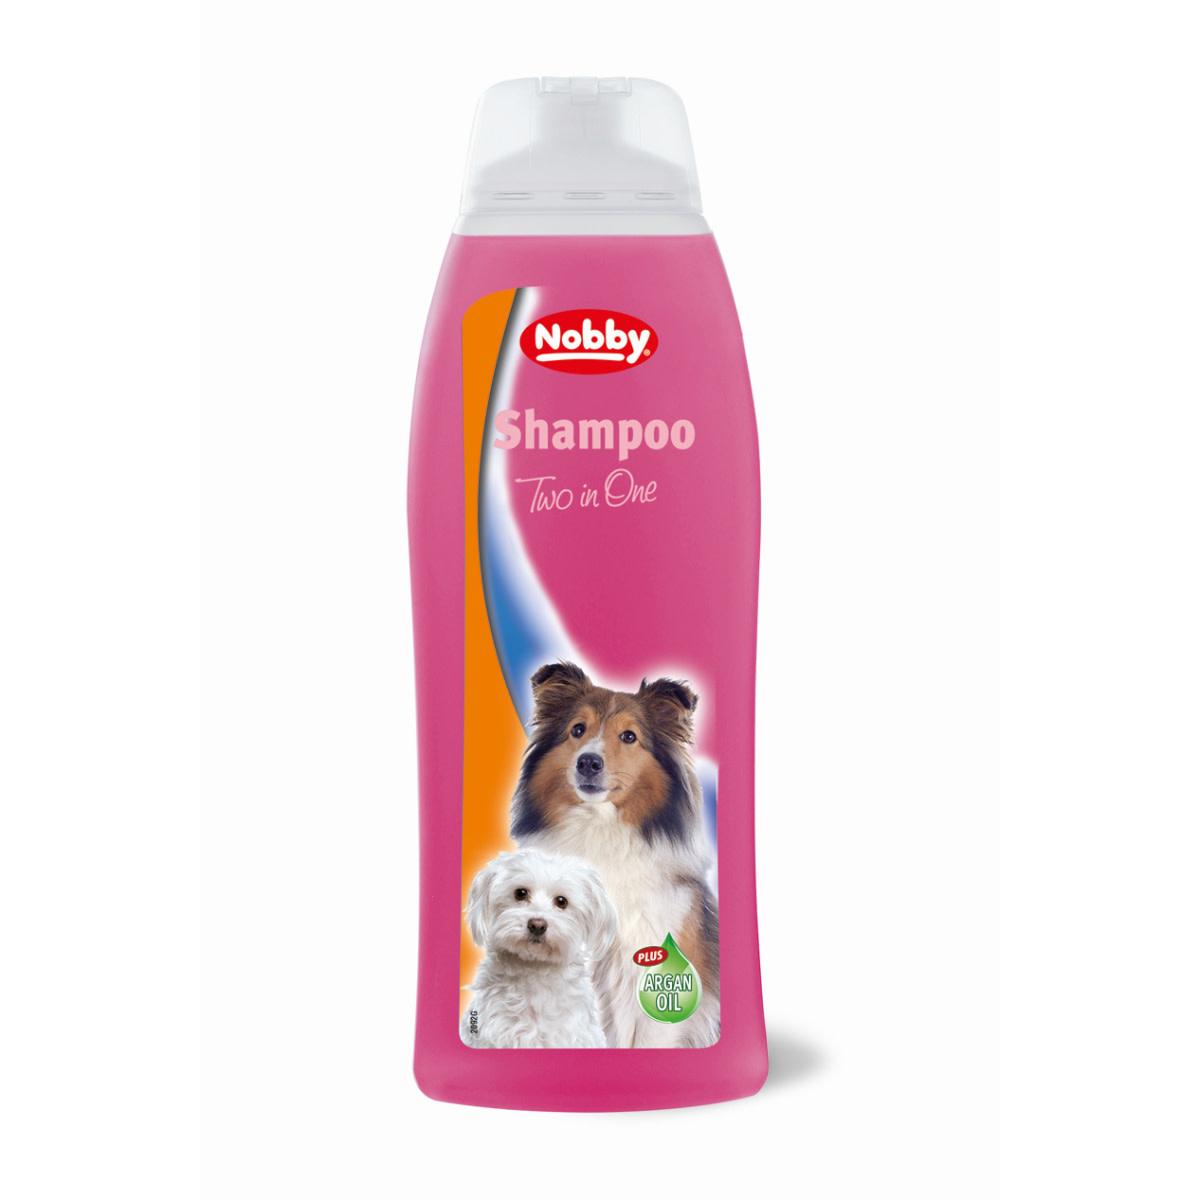 NOBBY NOBBY – SHAMPOO 2 IN 1 300 ML